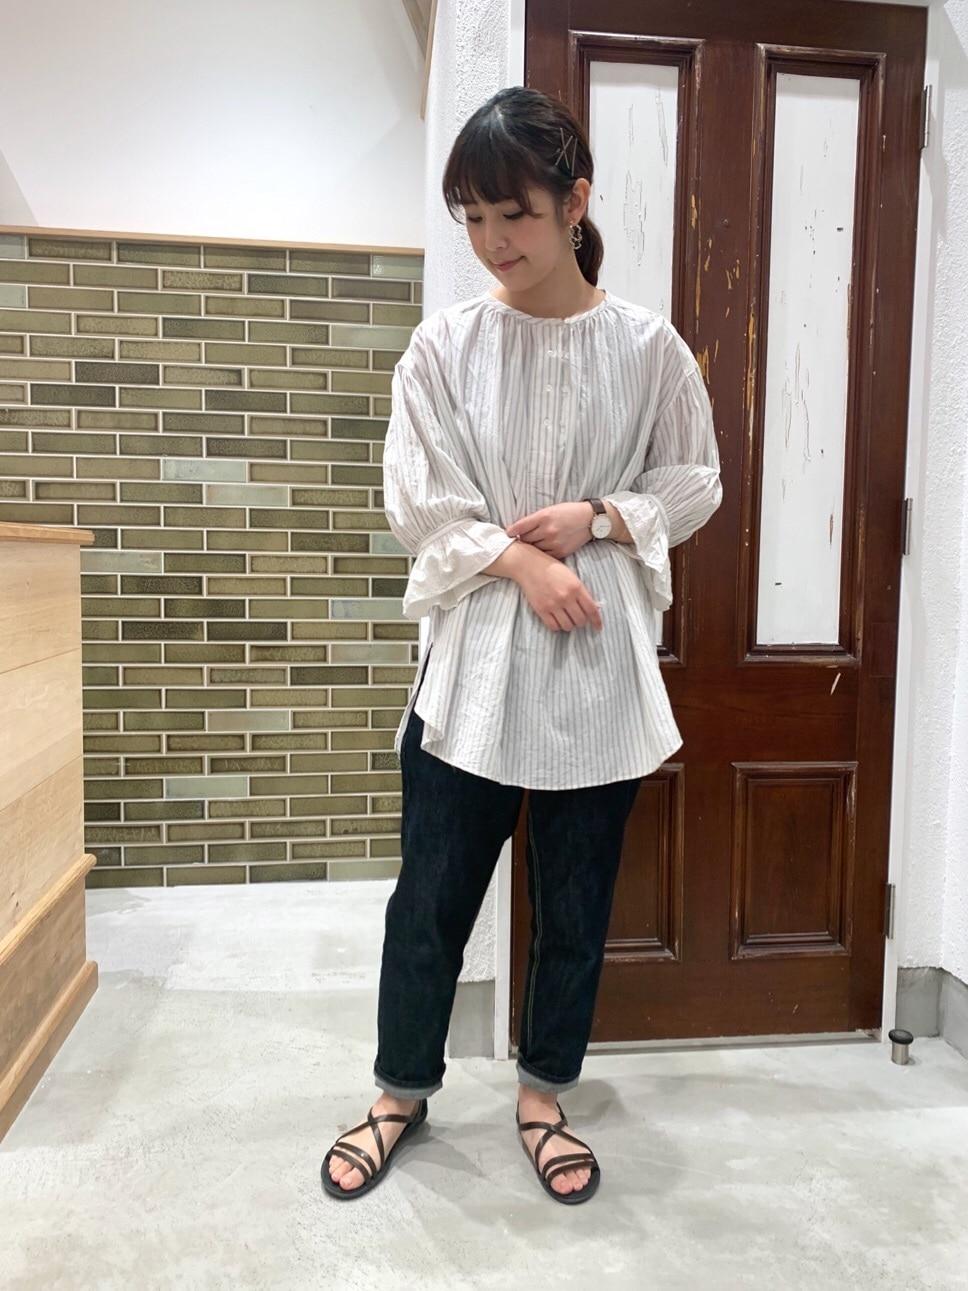 chambre de charme 横浜ジョイナス 身長:162cm 2020.08.22